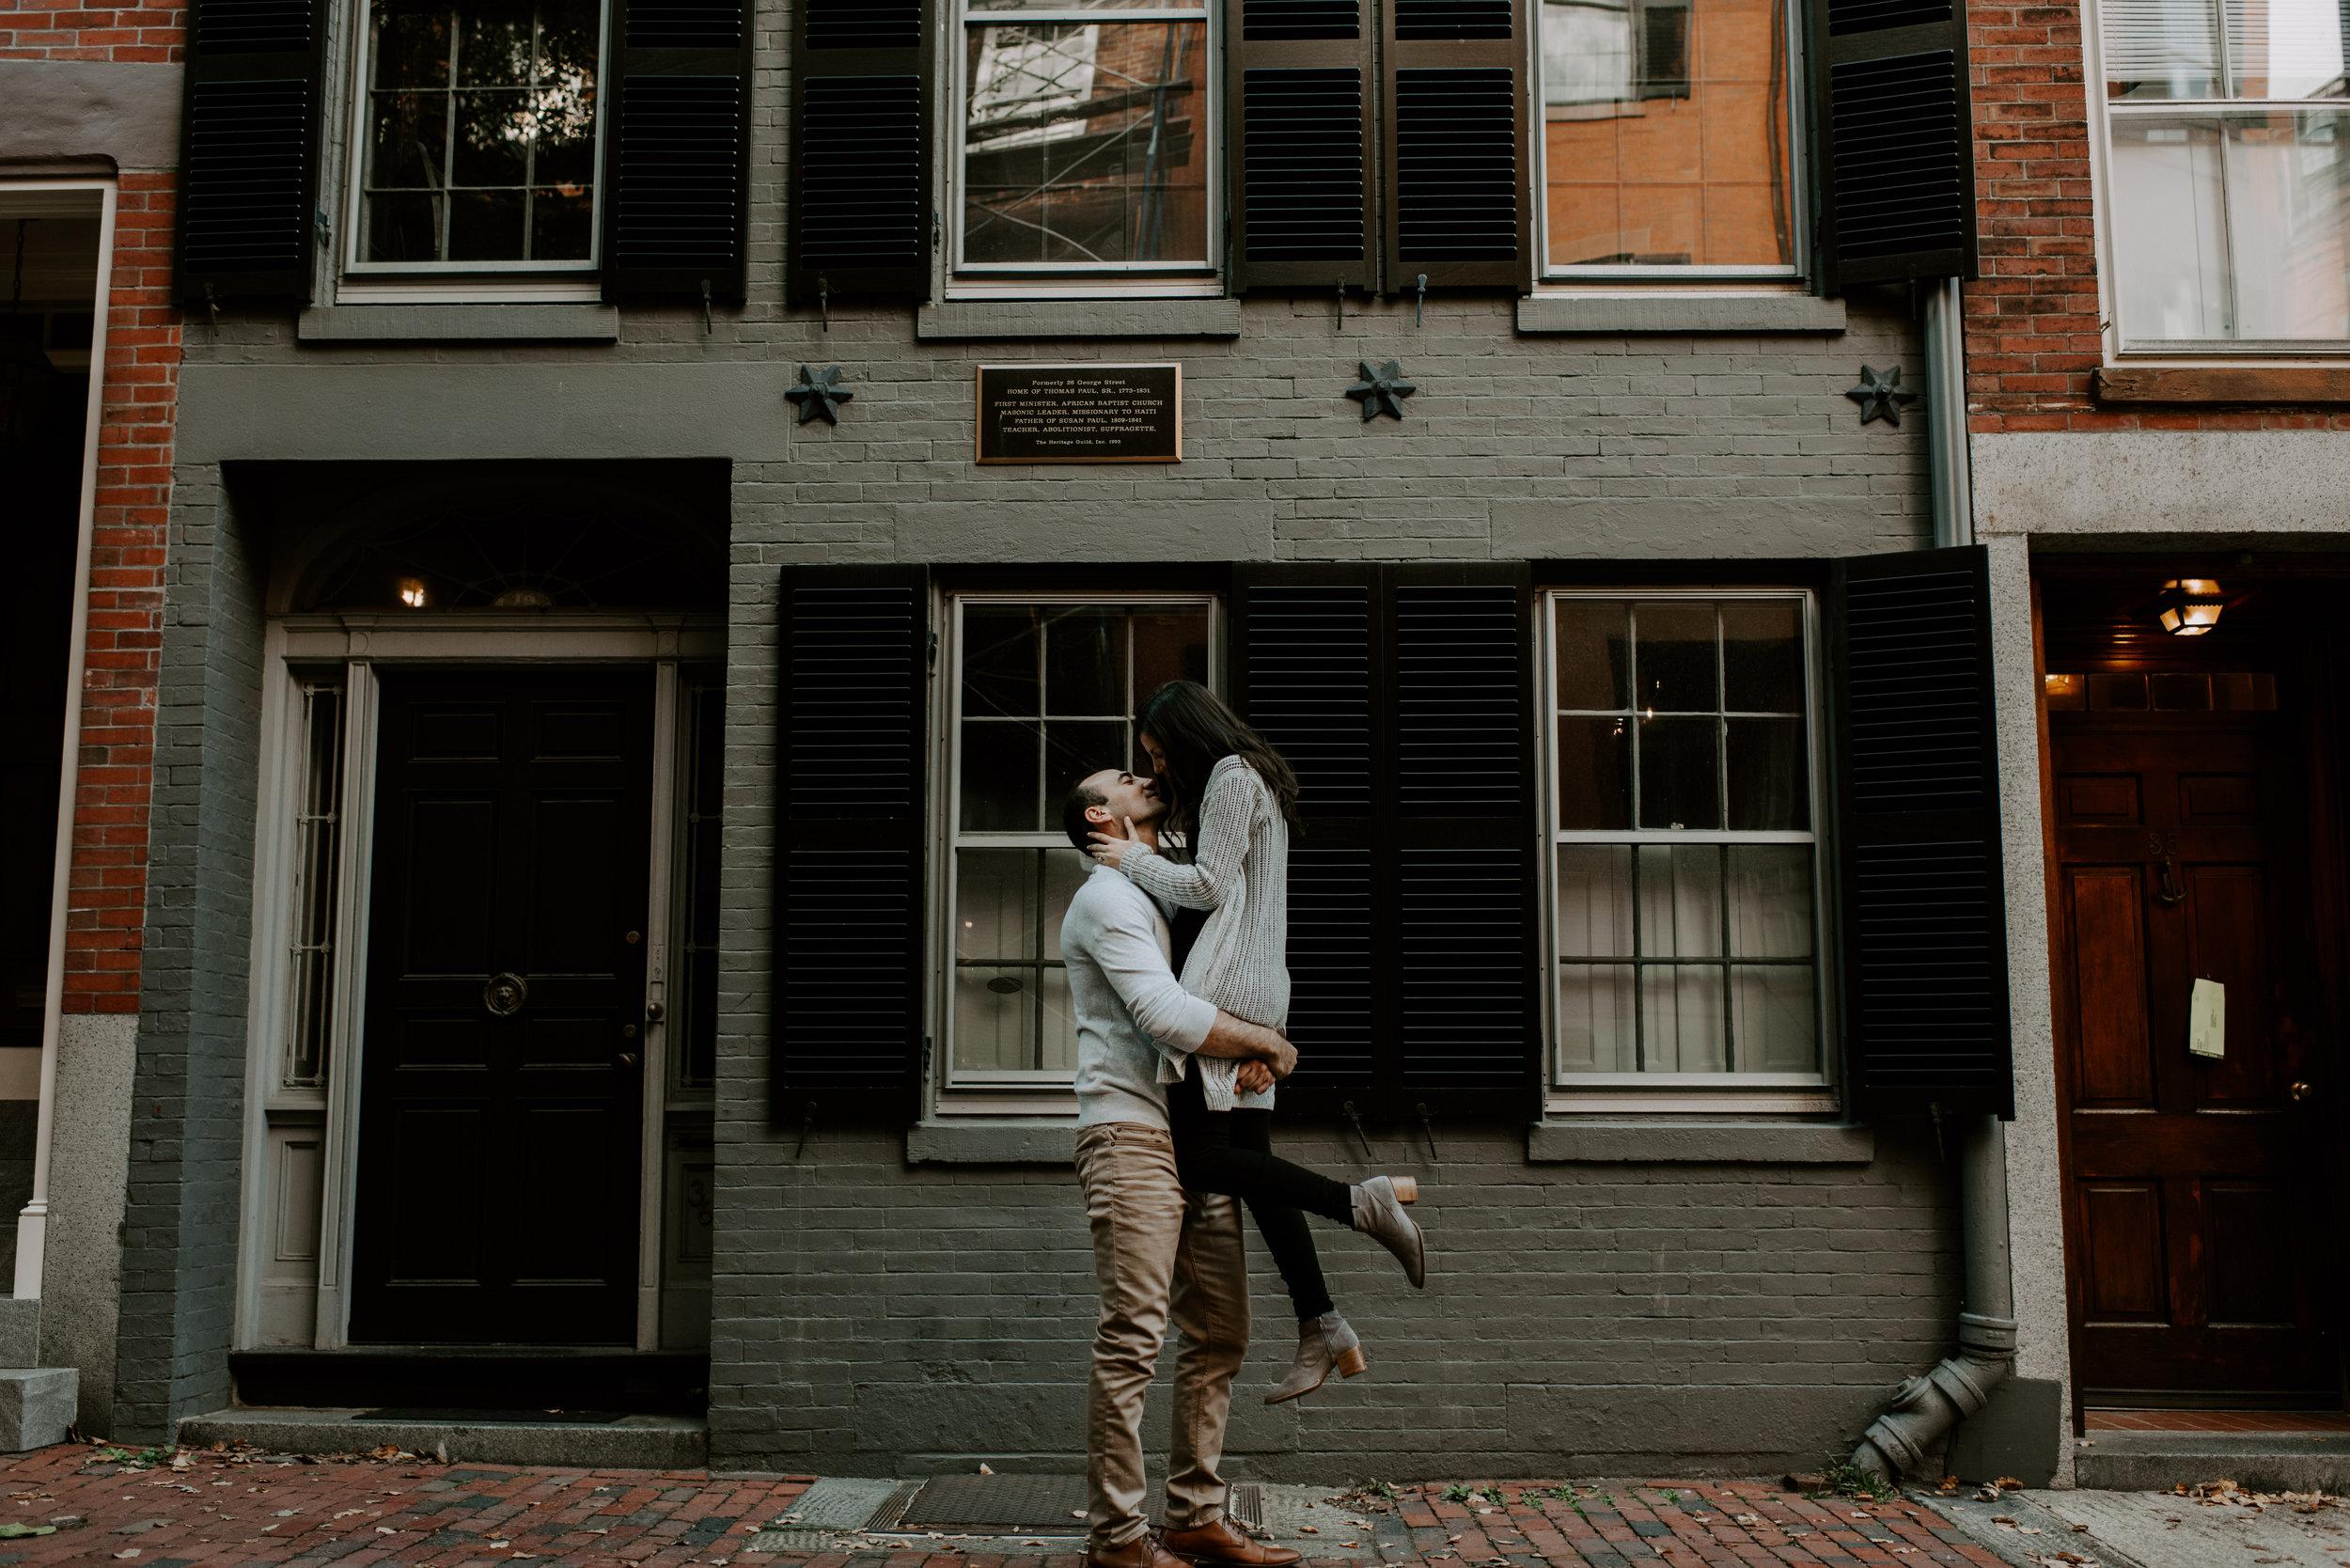 Dramatic and Moody Beacon Hill Boston Engagement Session | Boston Wedding Photographer | Madeline Rose Photography Co.